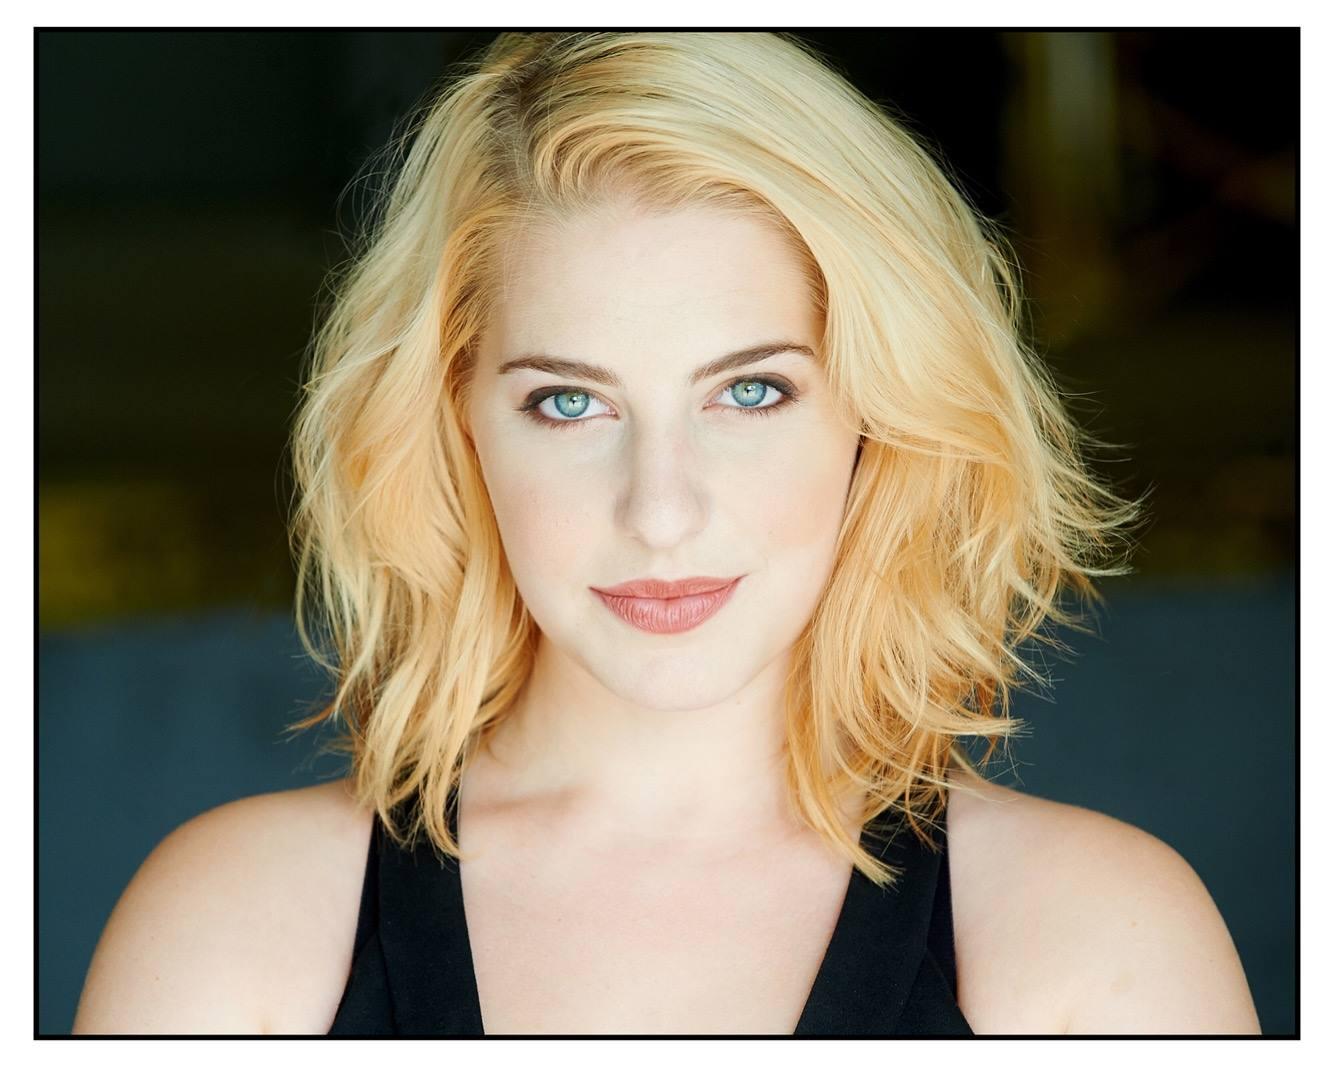 Toronto Actor: Raechel Fisher    Photographer: Tim Leyes